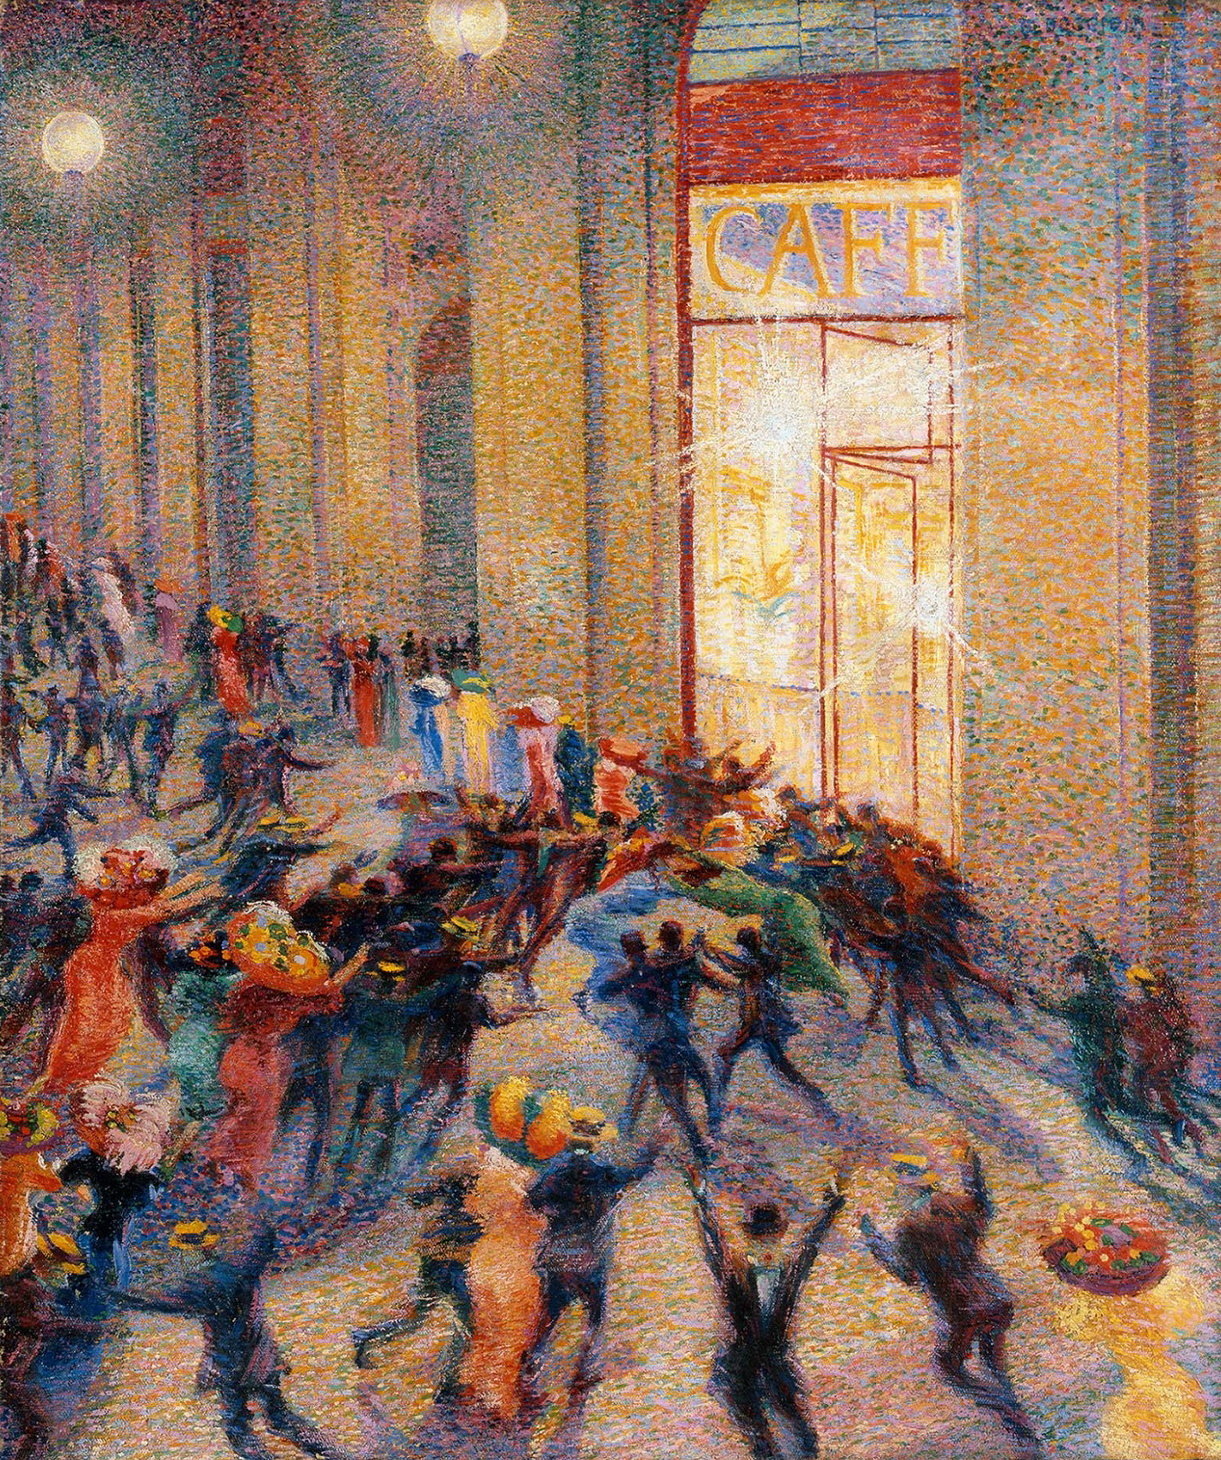 Umberto Boccioni, Rissa in Galleria, 1910.